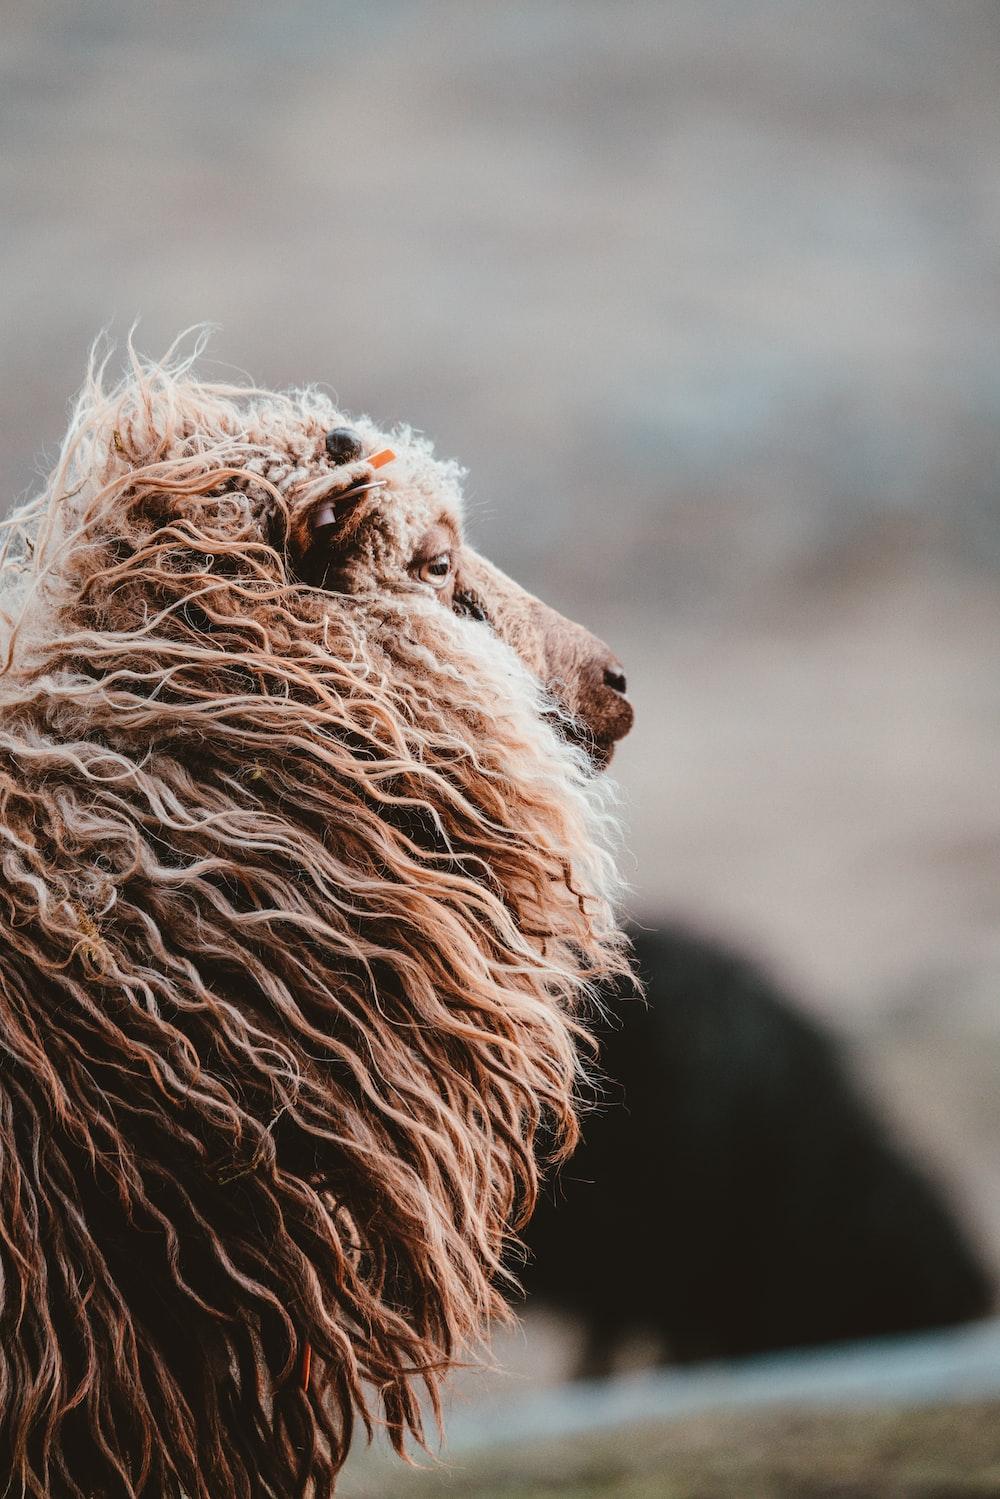 closeup photo of brown animal